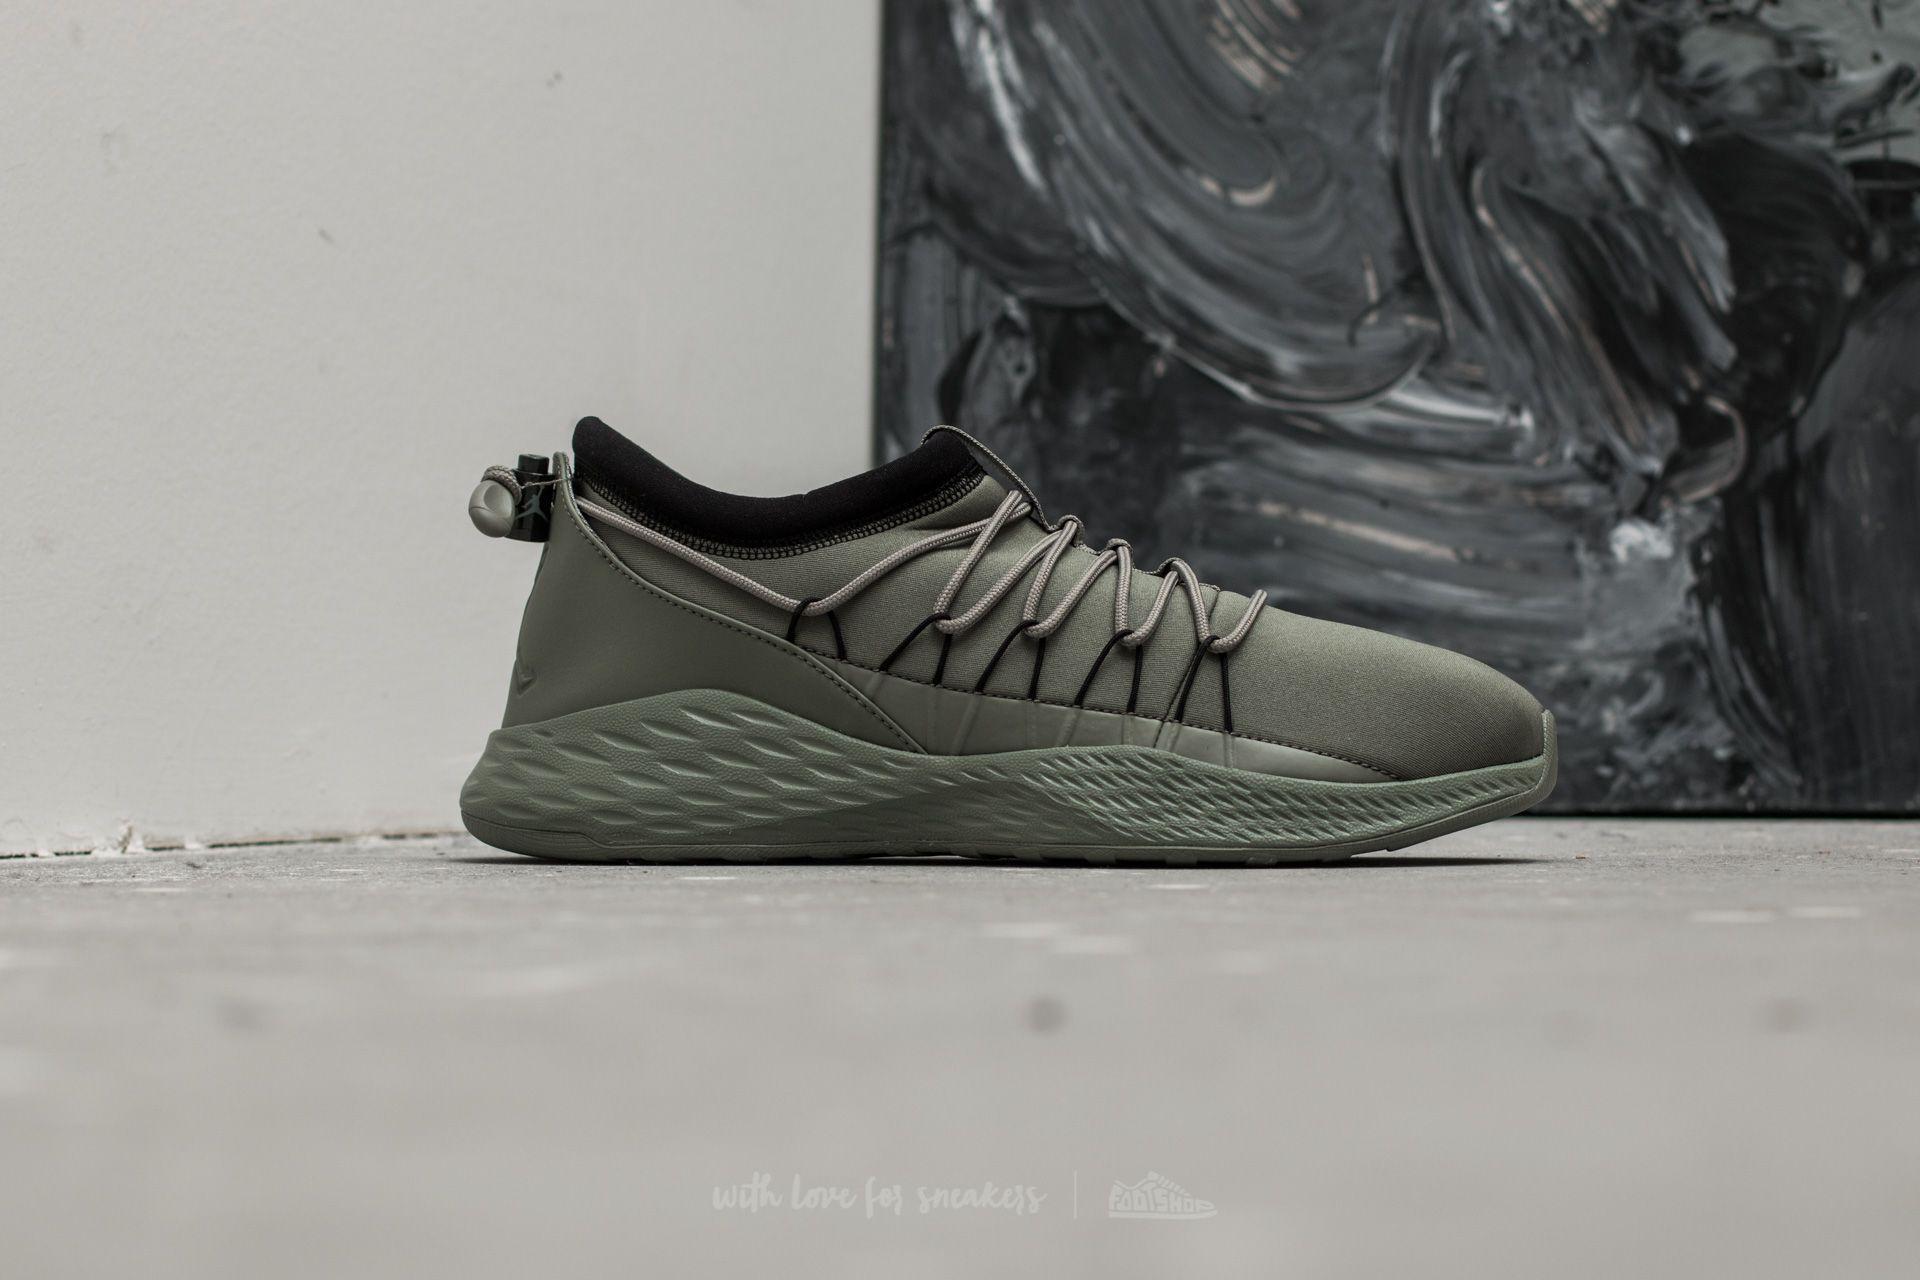 adbcd77e7f8 Jordan Formula 23 Toggle Dark Stucco/ Dark Stucco-Black | Footshop